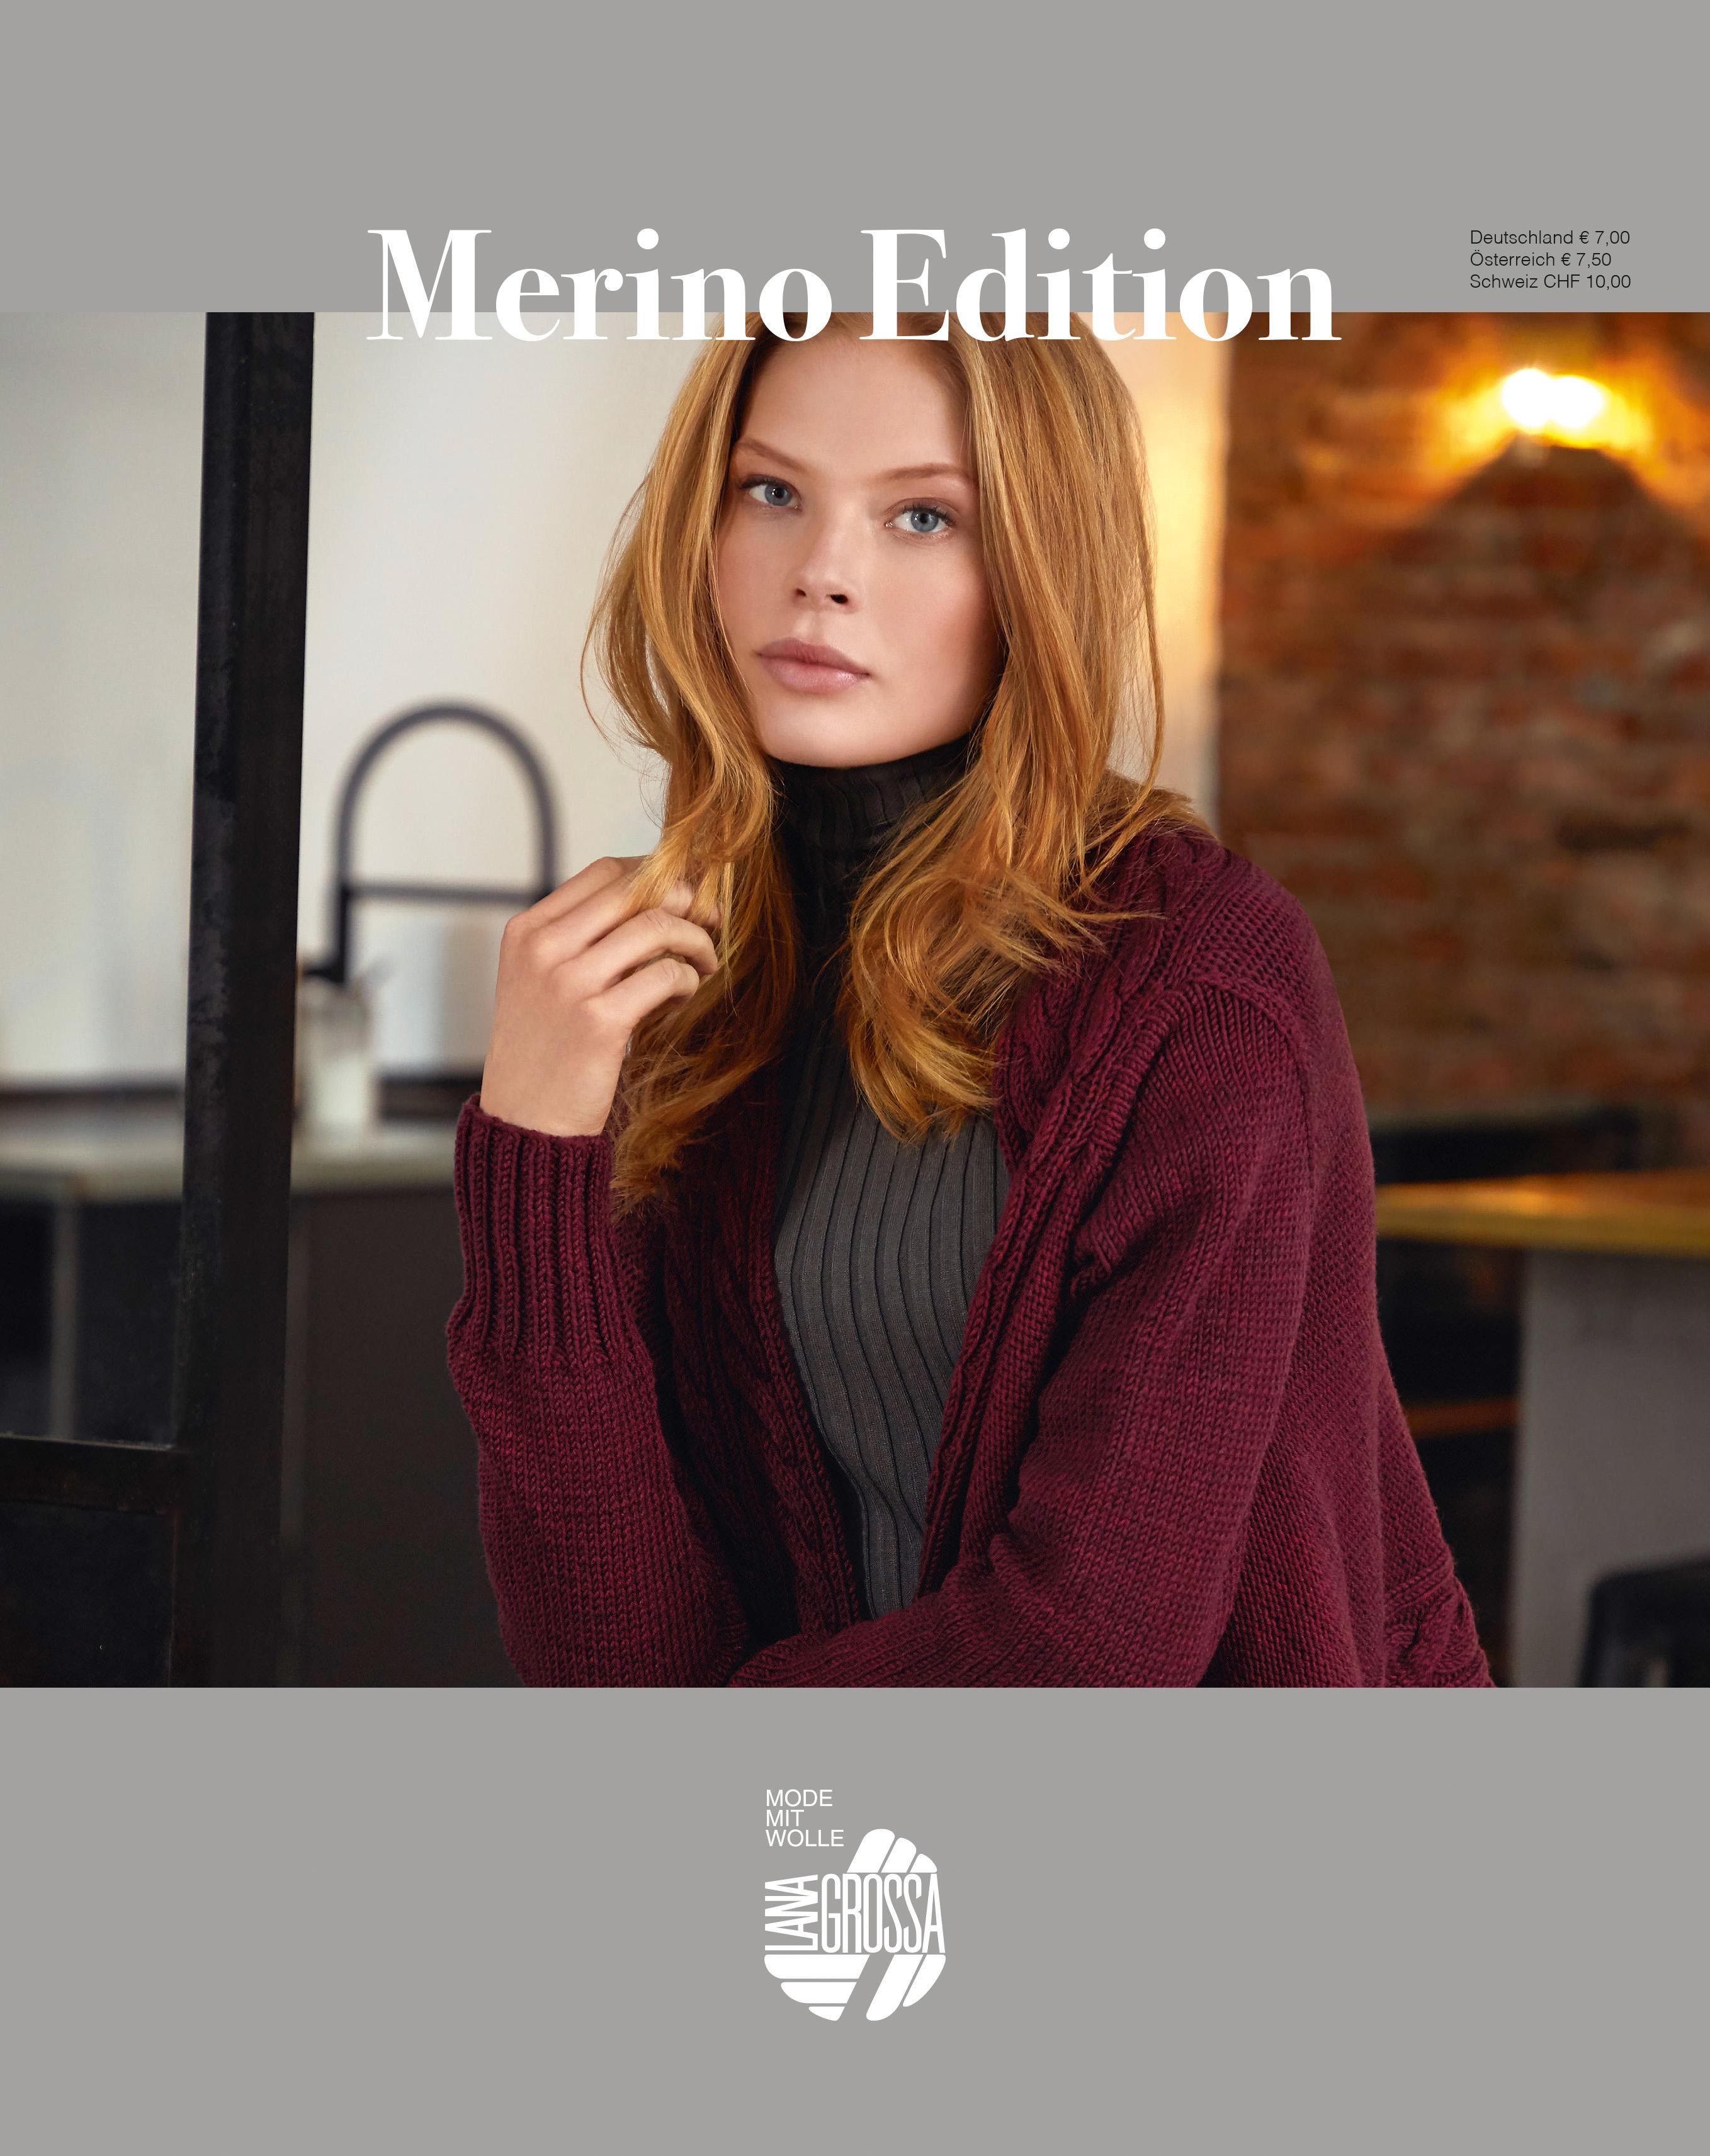 Lana Grossa Merino Edition No. 1 | FILATI.cc Onlineshop